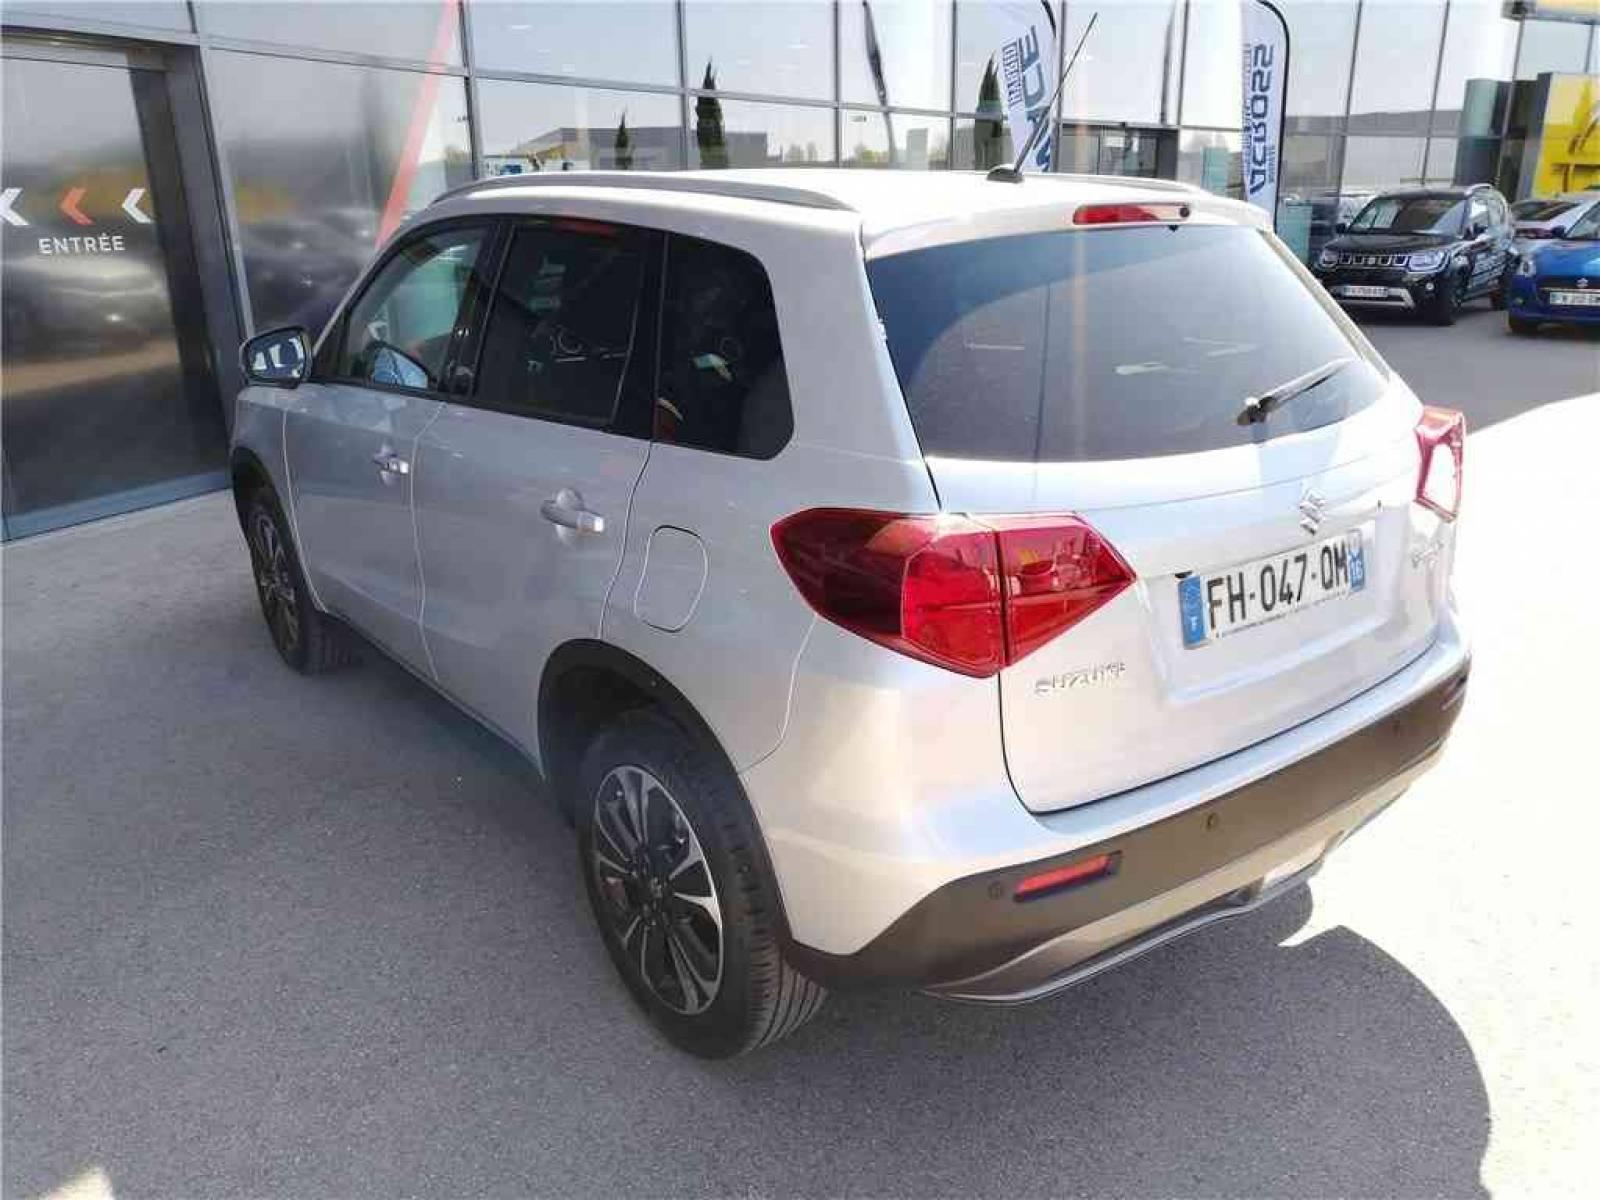 SUZUKI Vitara 1.0 Boosterjet - véhicule d'occasion - Groupe Guillet - Opel Magicauto - Chalon-sur-Saône - 71380 - Saint-Marcel - 2